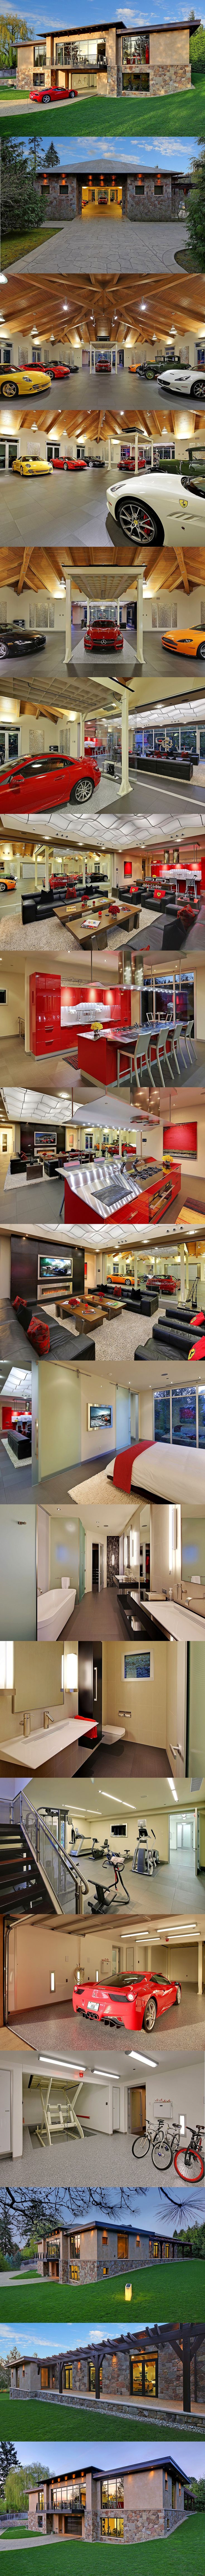 Incredible auto-enthusiast mansion with 16 car garage and built-in car elevator. Ferrari 458, Audi R8, Porsche 911 Turbo, Aston Martin V8 Vantage, Mercedes AMG. Bellevue, Washington